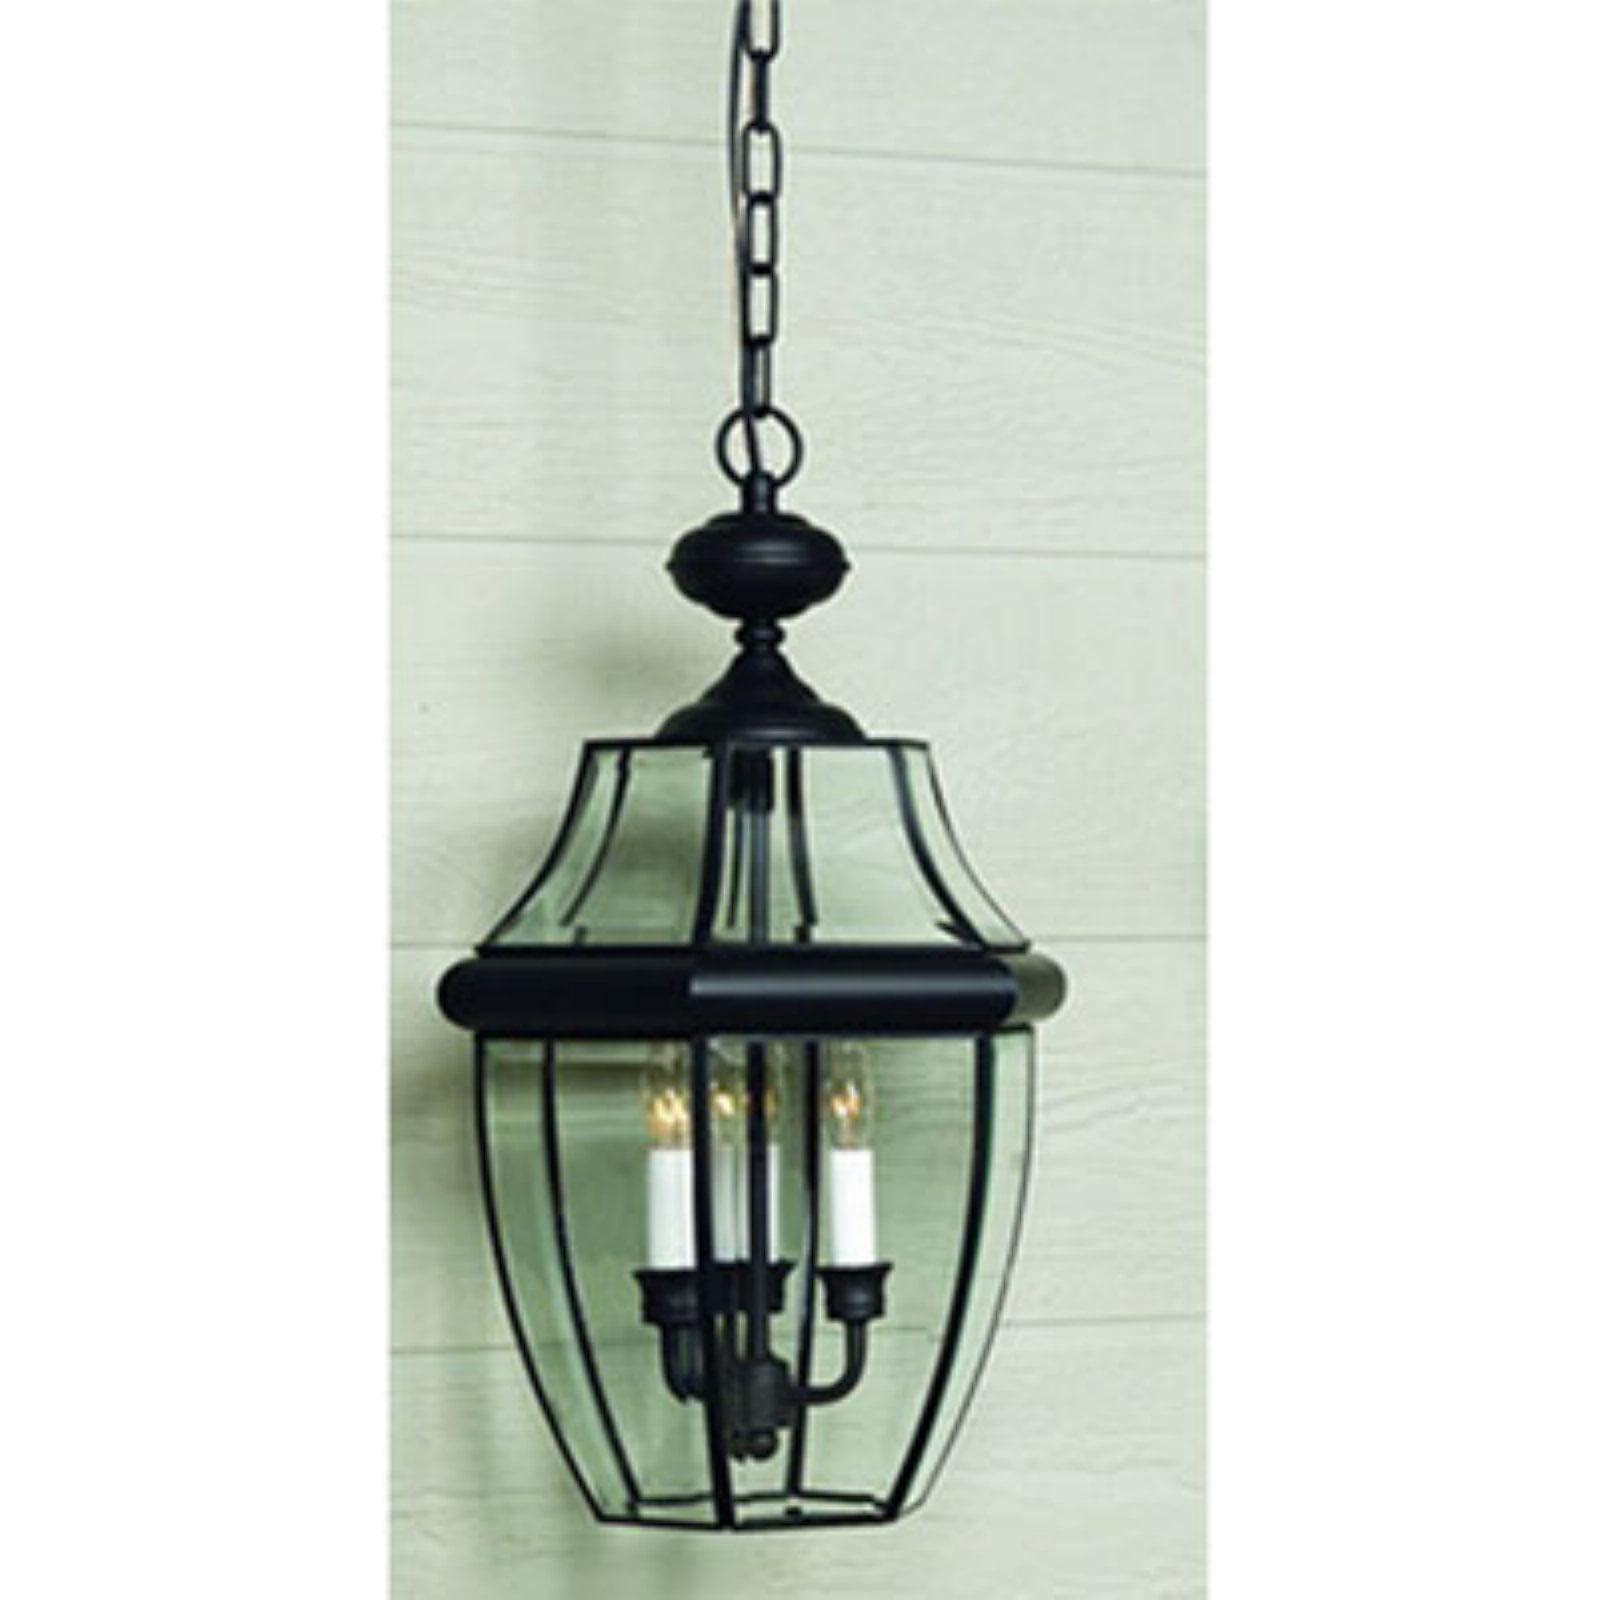 Quoizel Newbury NY1180K Outdoor Hanging Lantern by Quoizel